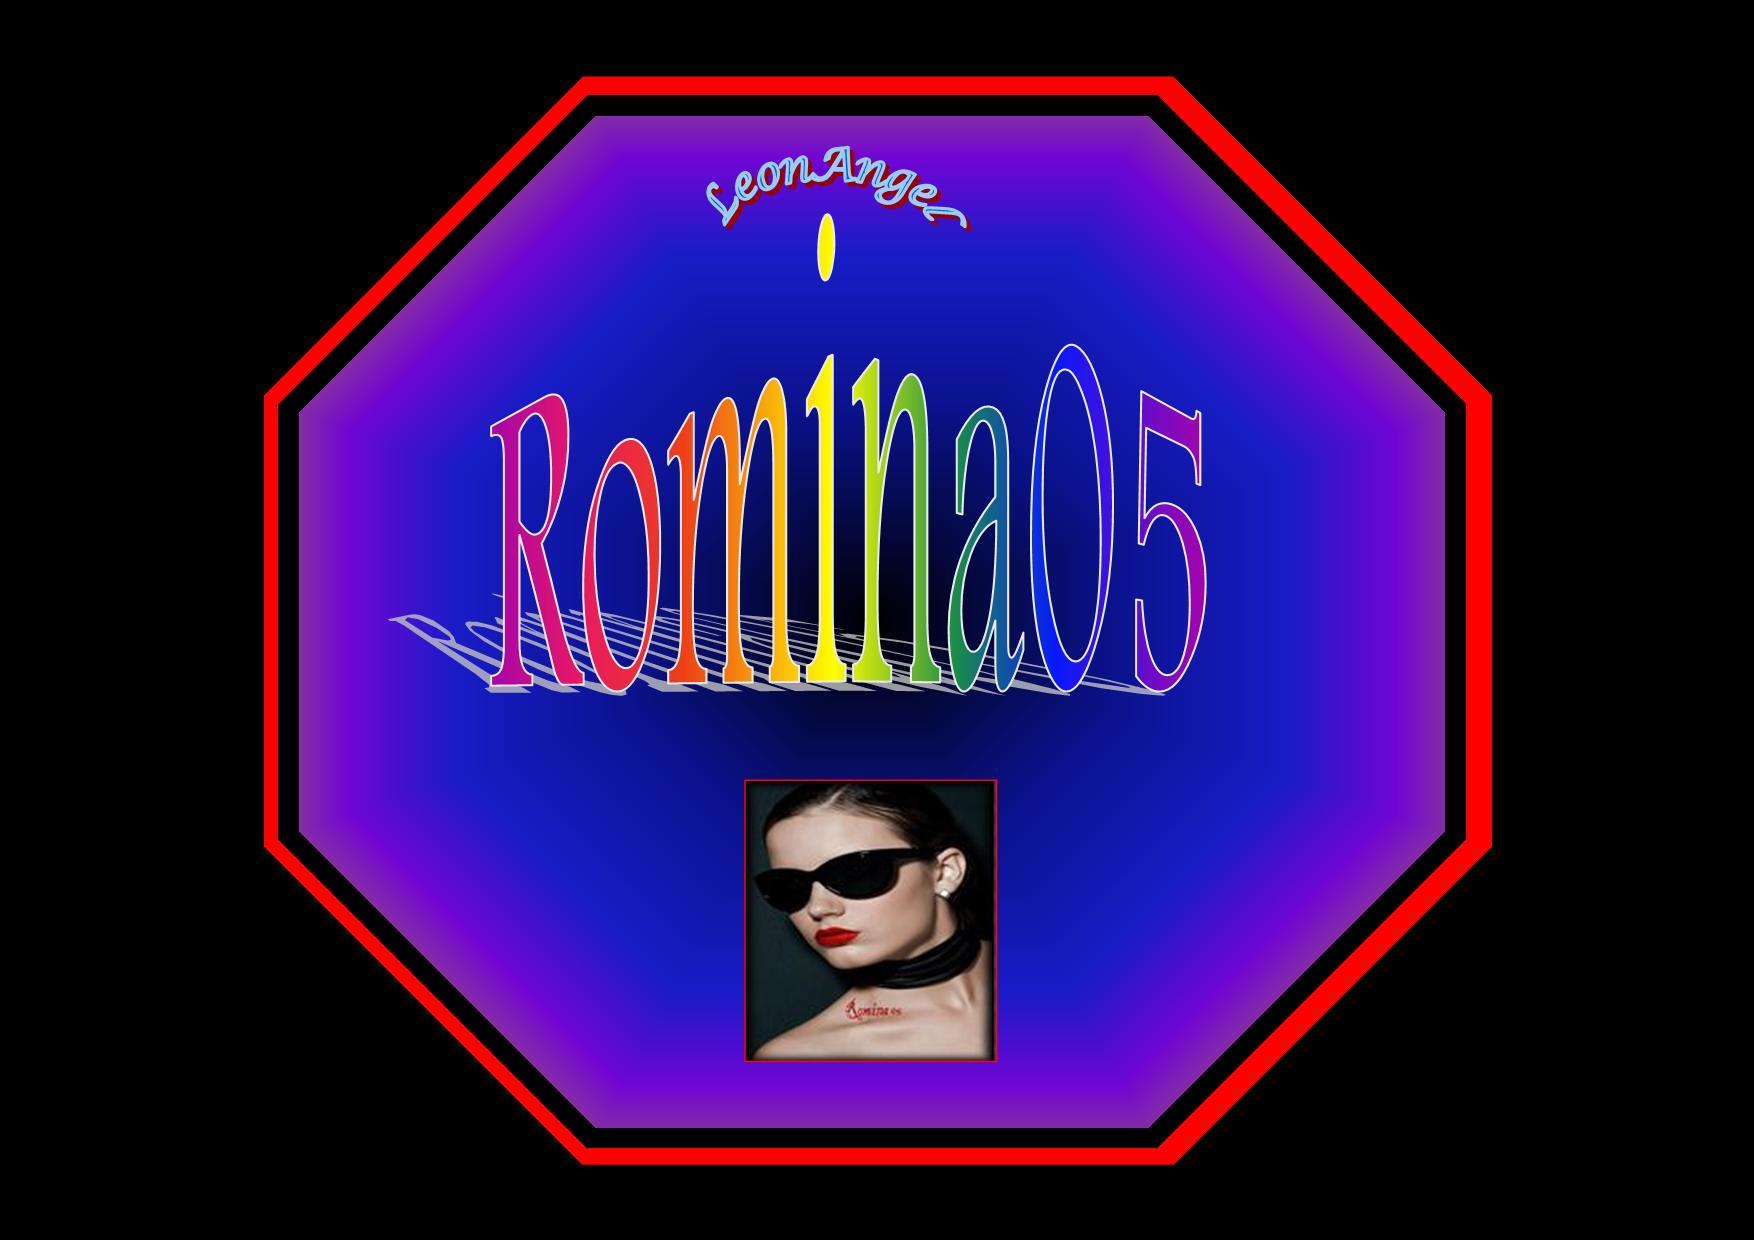 http://digilander.libero.it/romina05/immg.Leon/Romina05%206-1.jpg